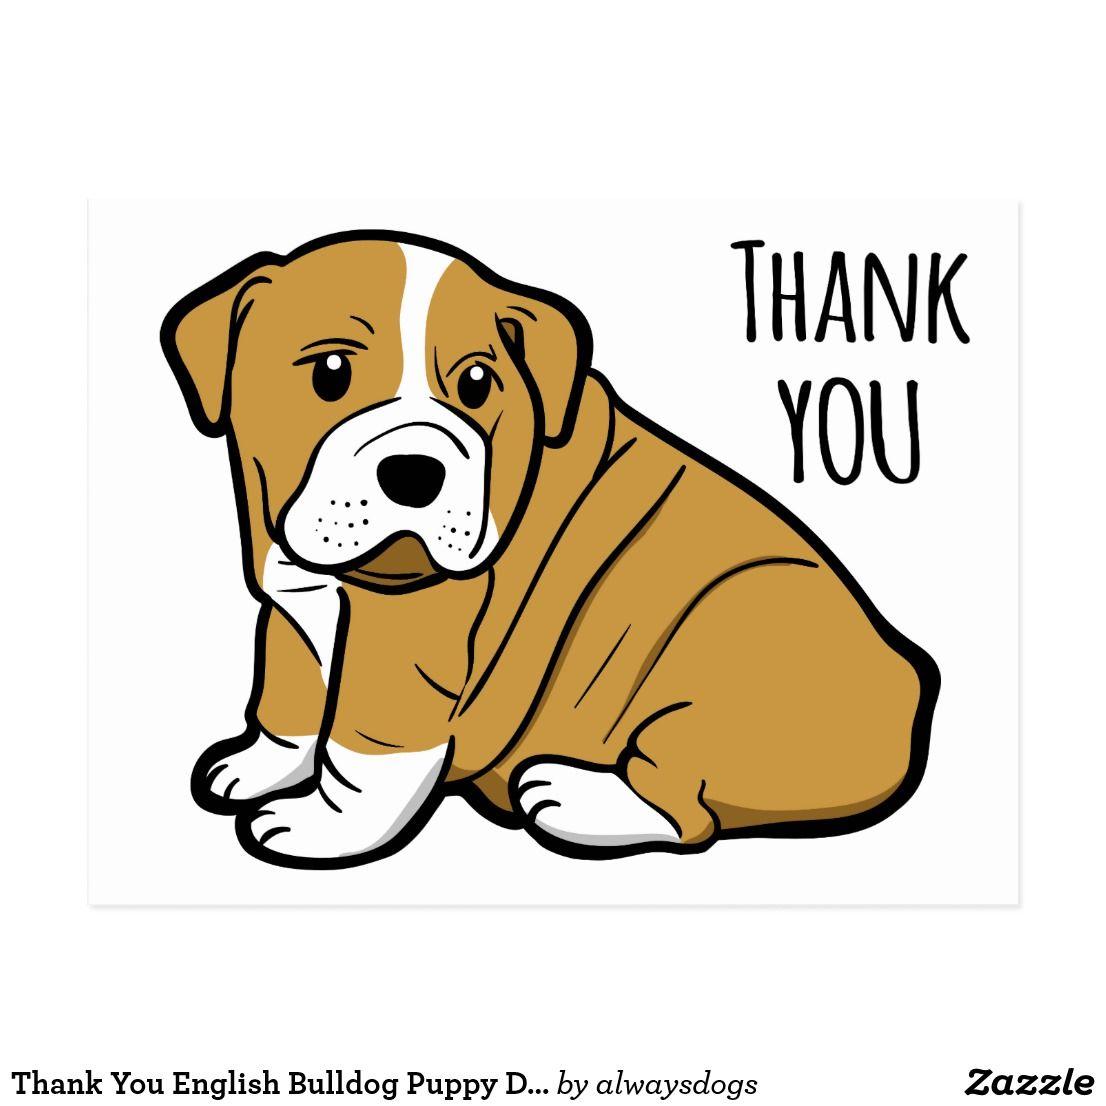 Thank You English Bulldog Puppy Dog Cartoon Postcard Zazzle Com